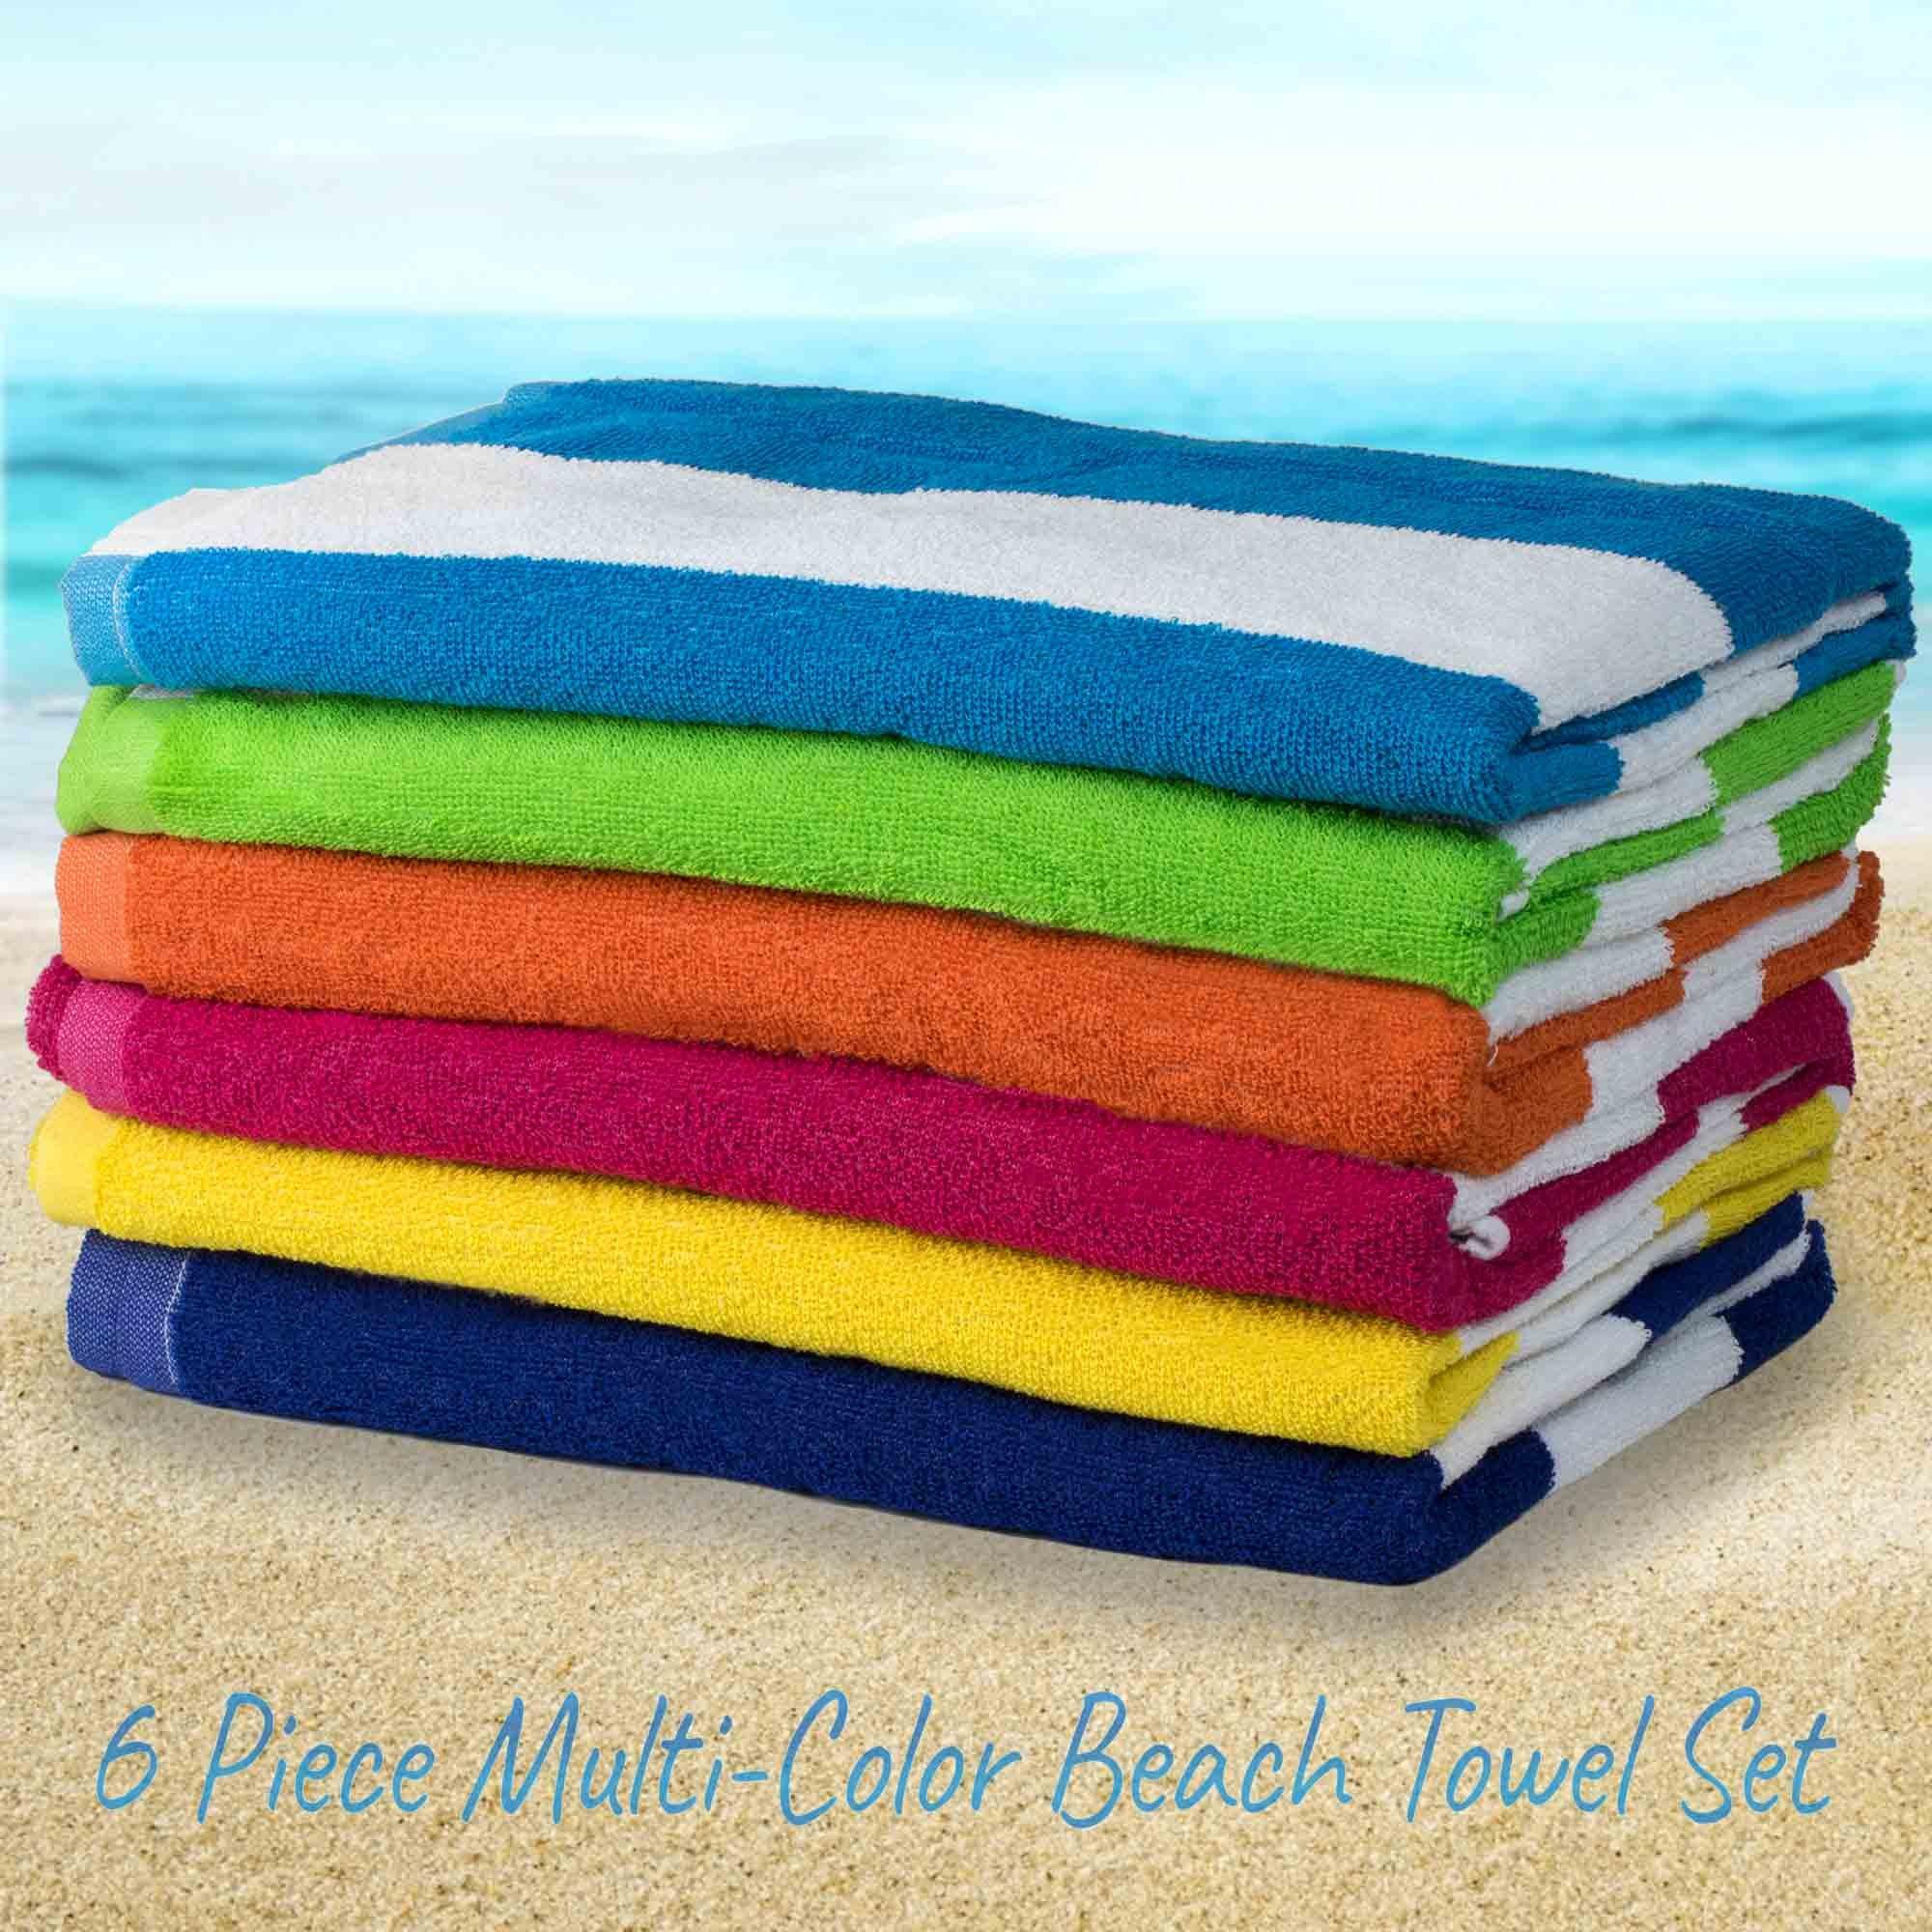 HowPlumb Large Beach Pool Towel Striped Cotton Blend, Cabana Stripe Variety 6 Pack, 30'' x 60''